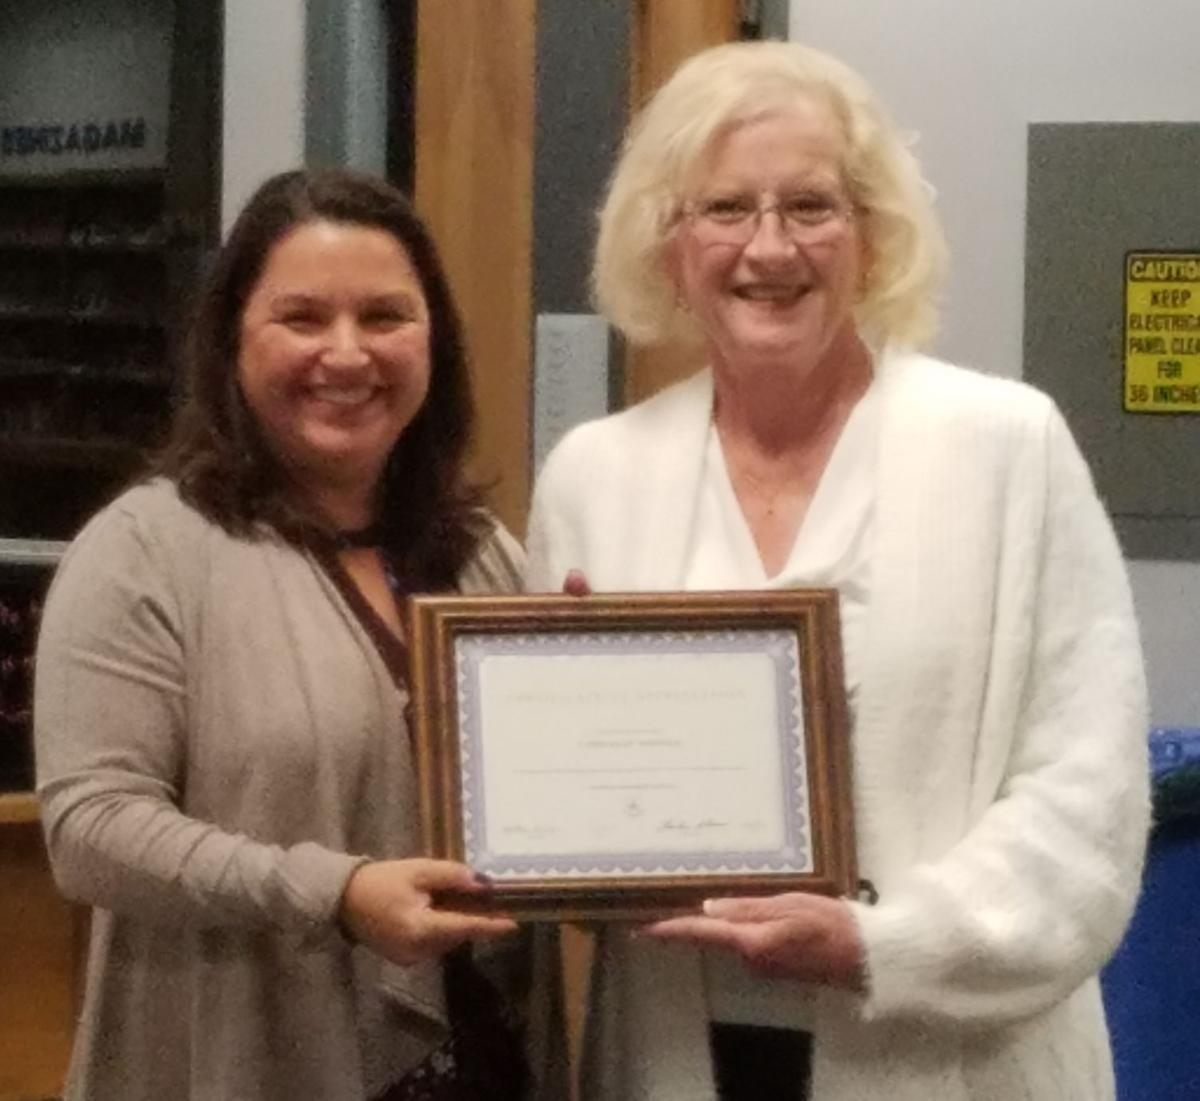 Warren schools honor staff member who saved choking student